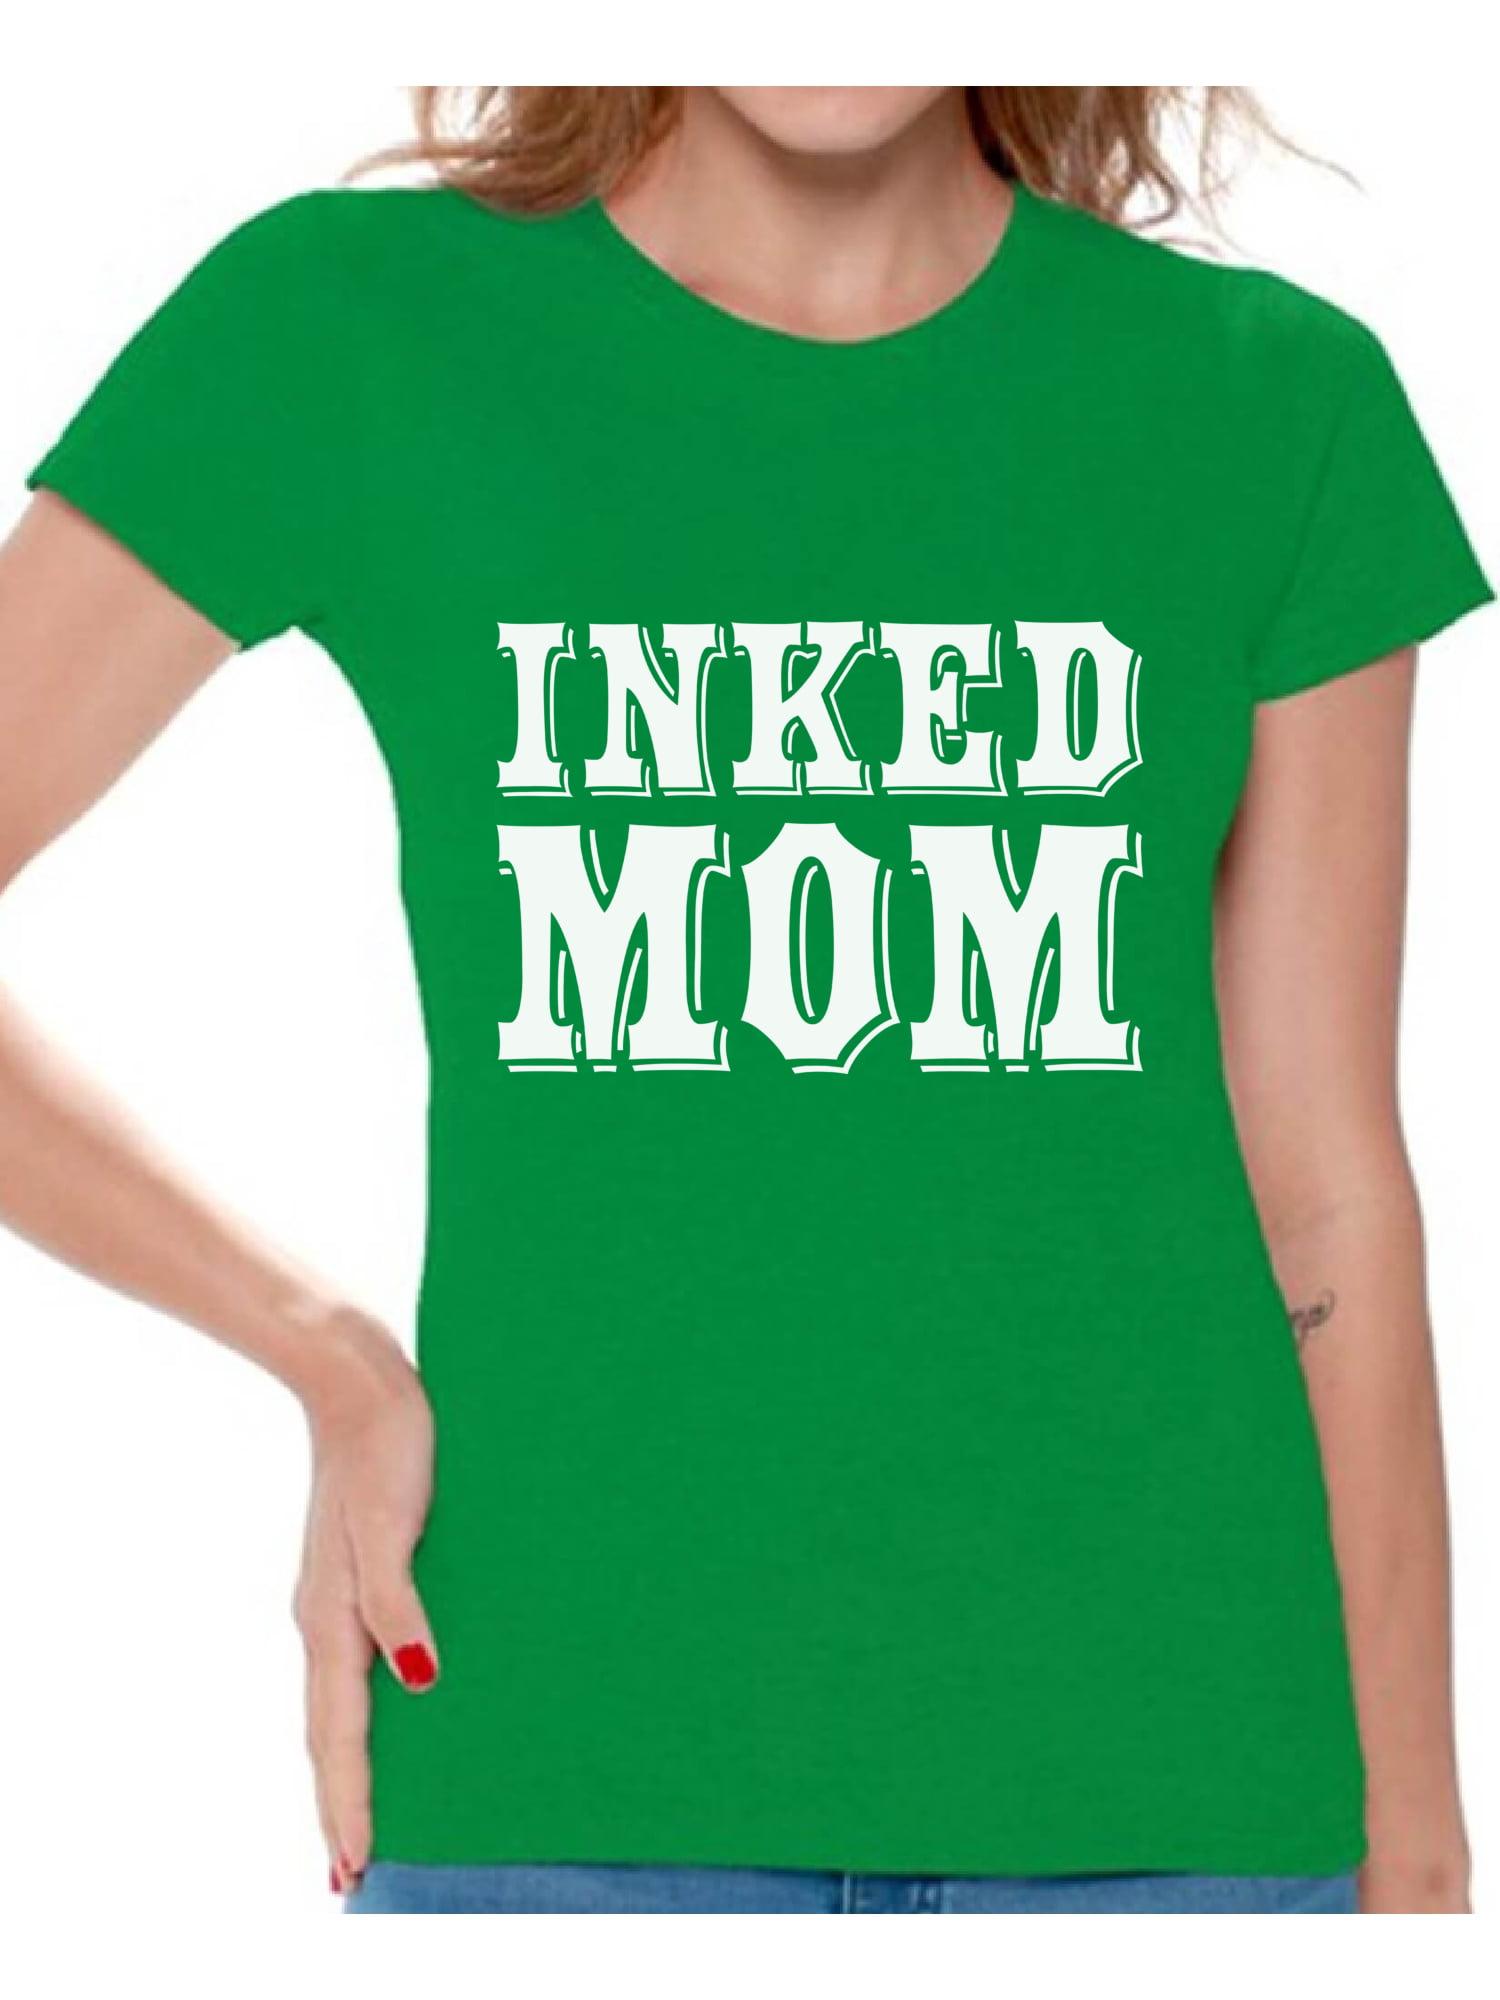 c585f75e Awkward Styles Inked Mom Tshirt for Women Tattooed Mom Shirt Tatted Mom T  Shirt Best Gifts for Mom Cool Tattoo Mom Shirt Tattoo Shirts with Sayings  for ...